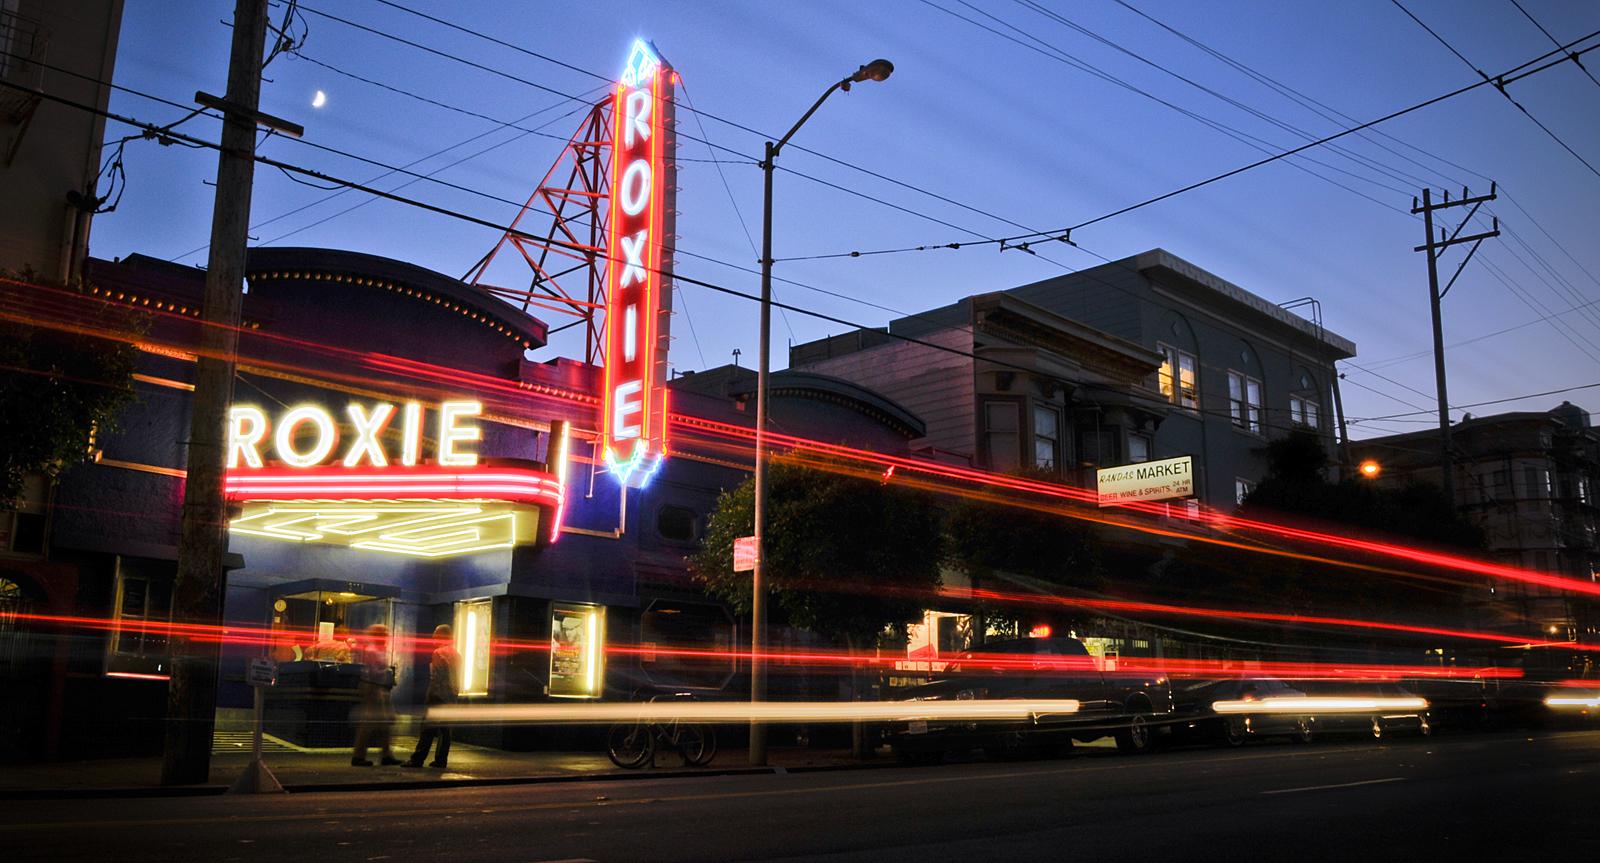 Roxie Theater venue image